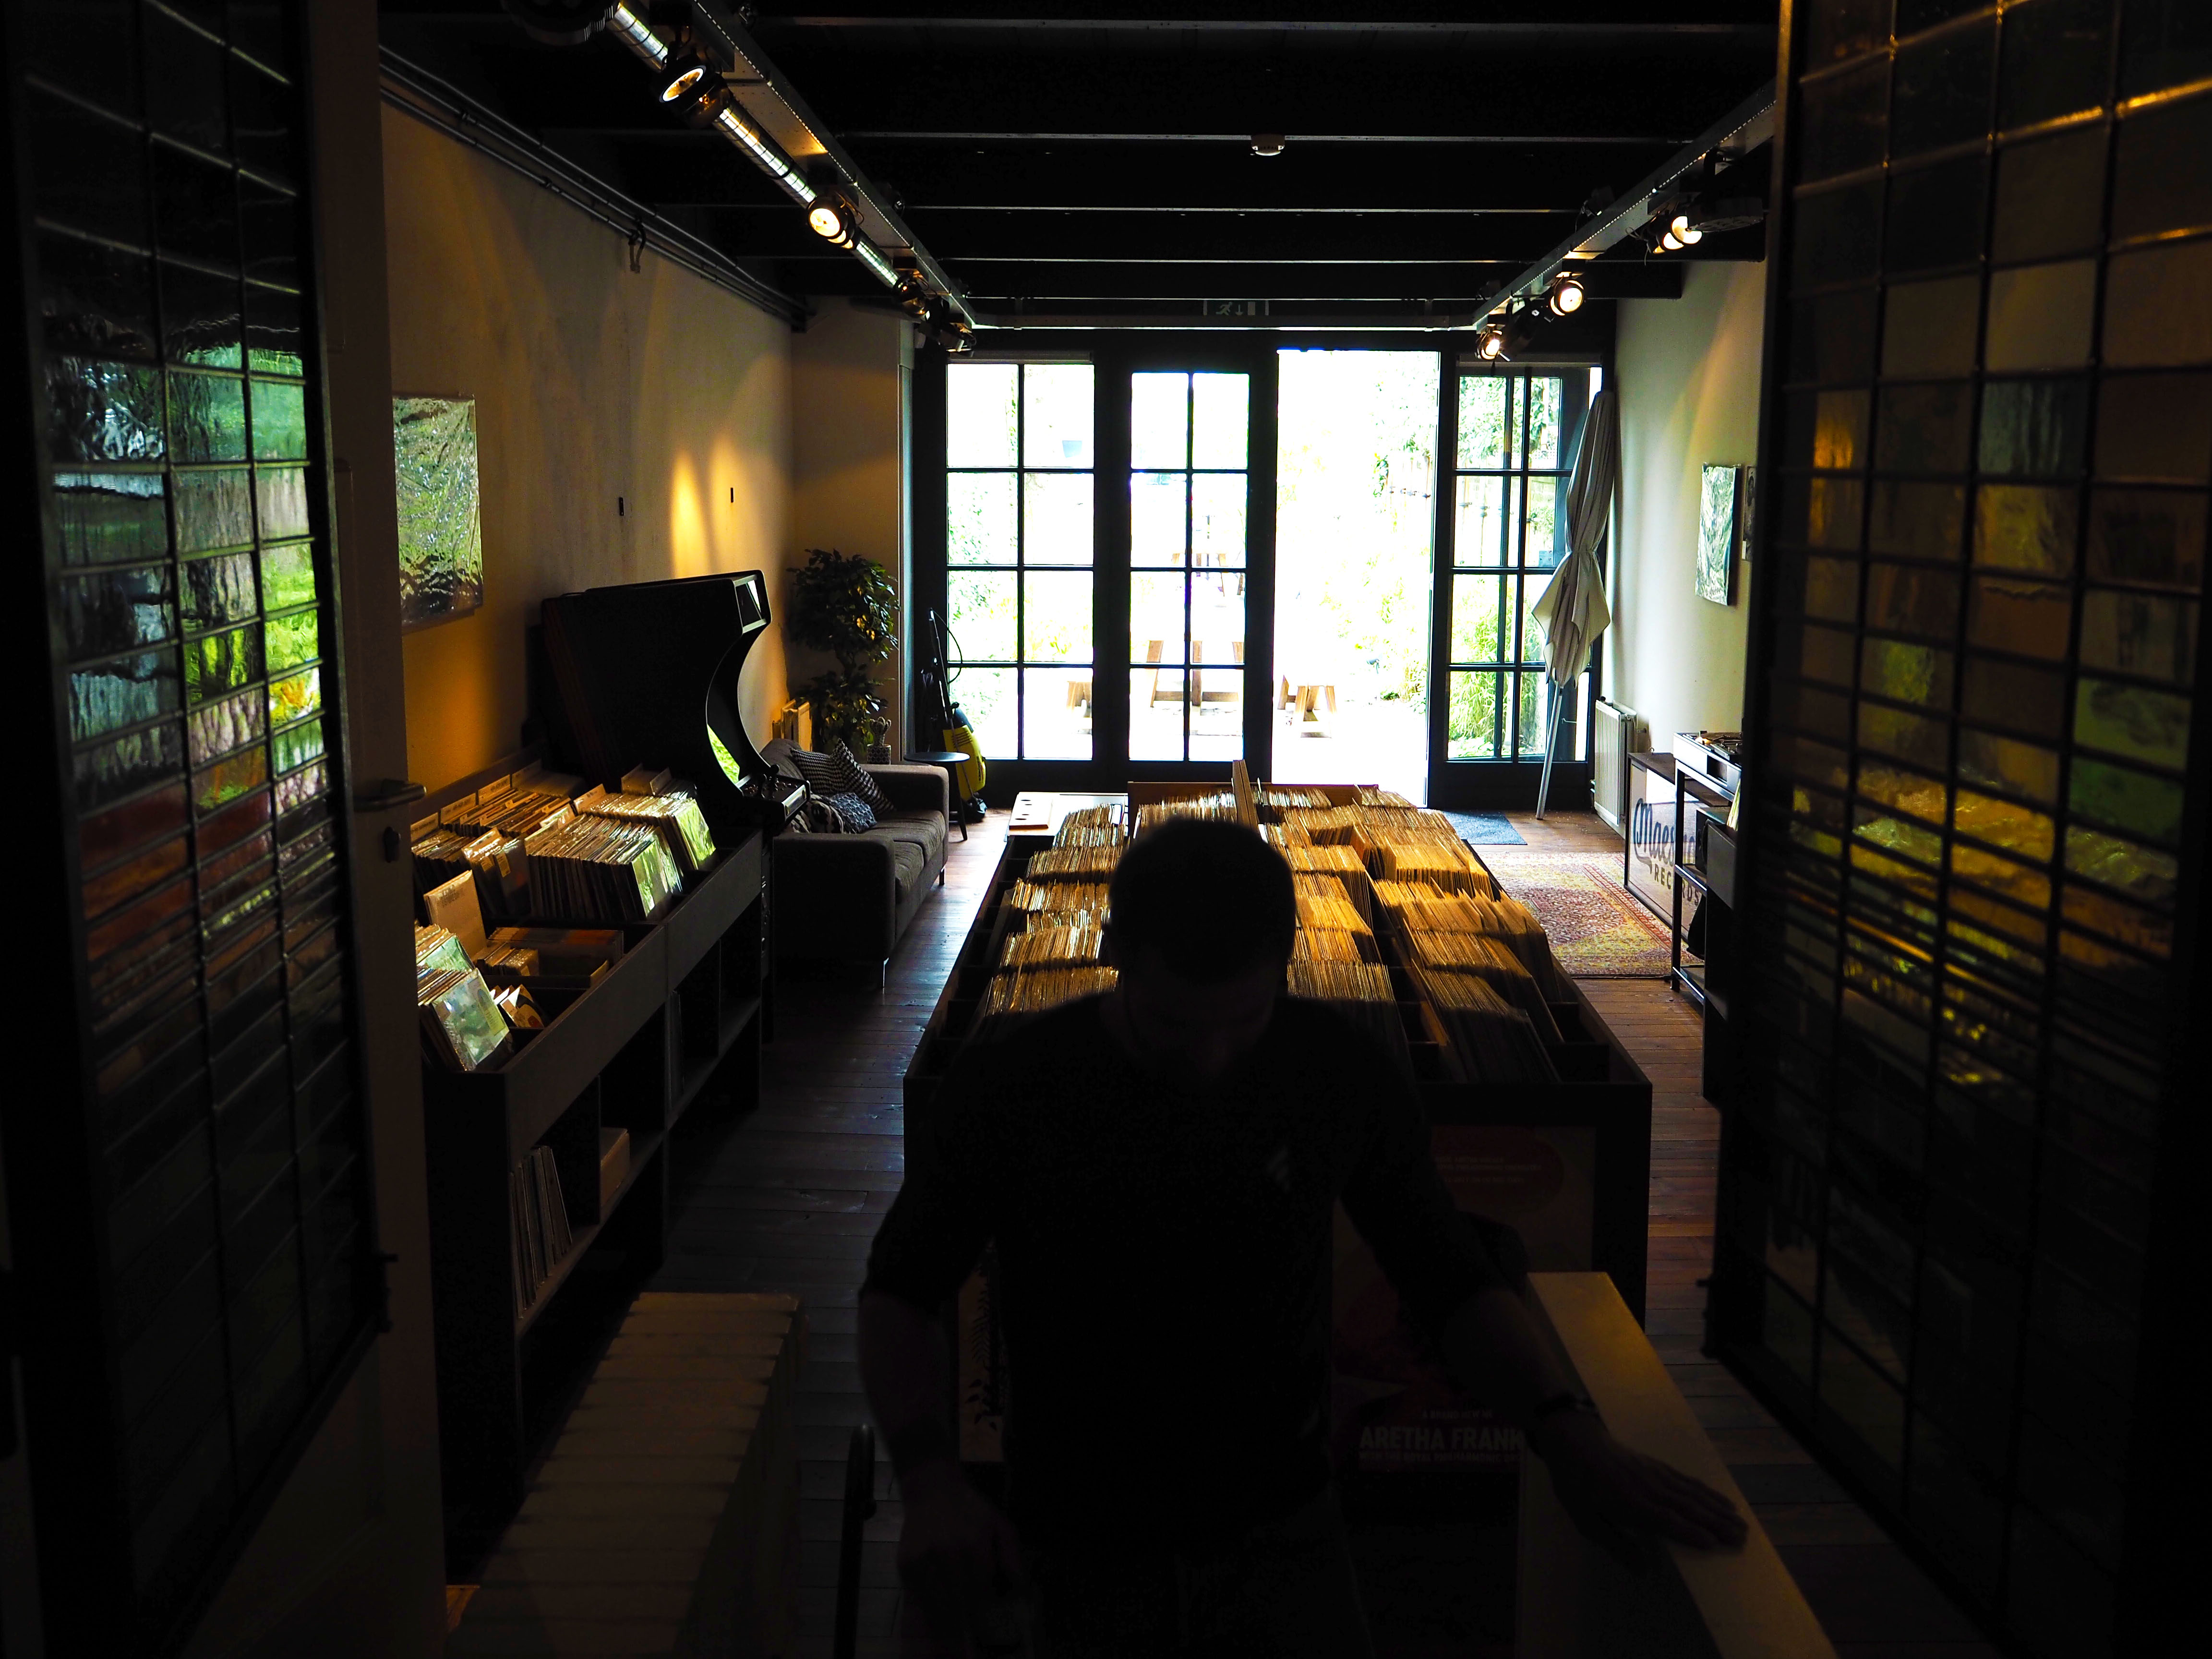 maestro's recordcafé